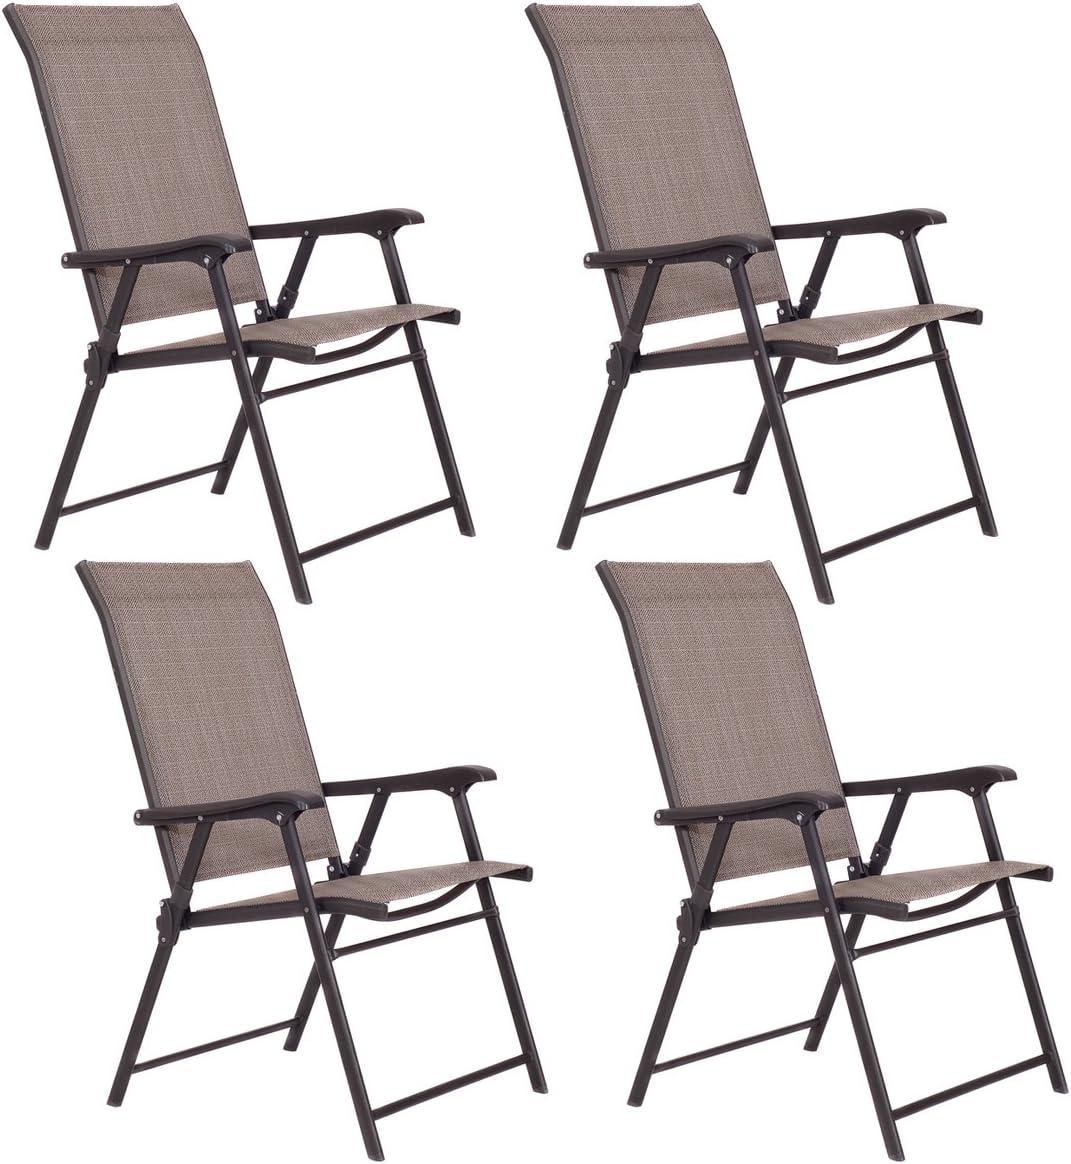 Giantex Patio Folding Sling Chairs Furniture Camping Deck Garden Pool Beach Set of 4